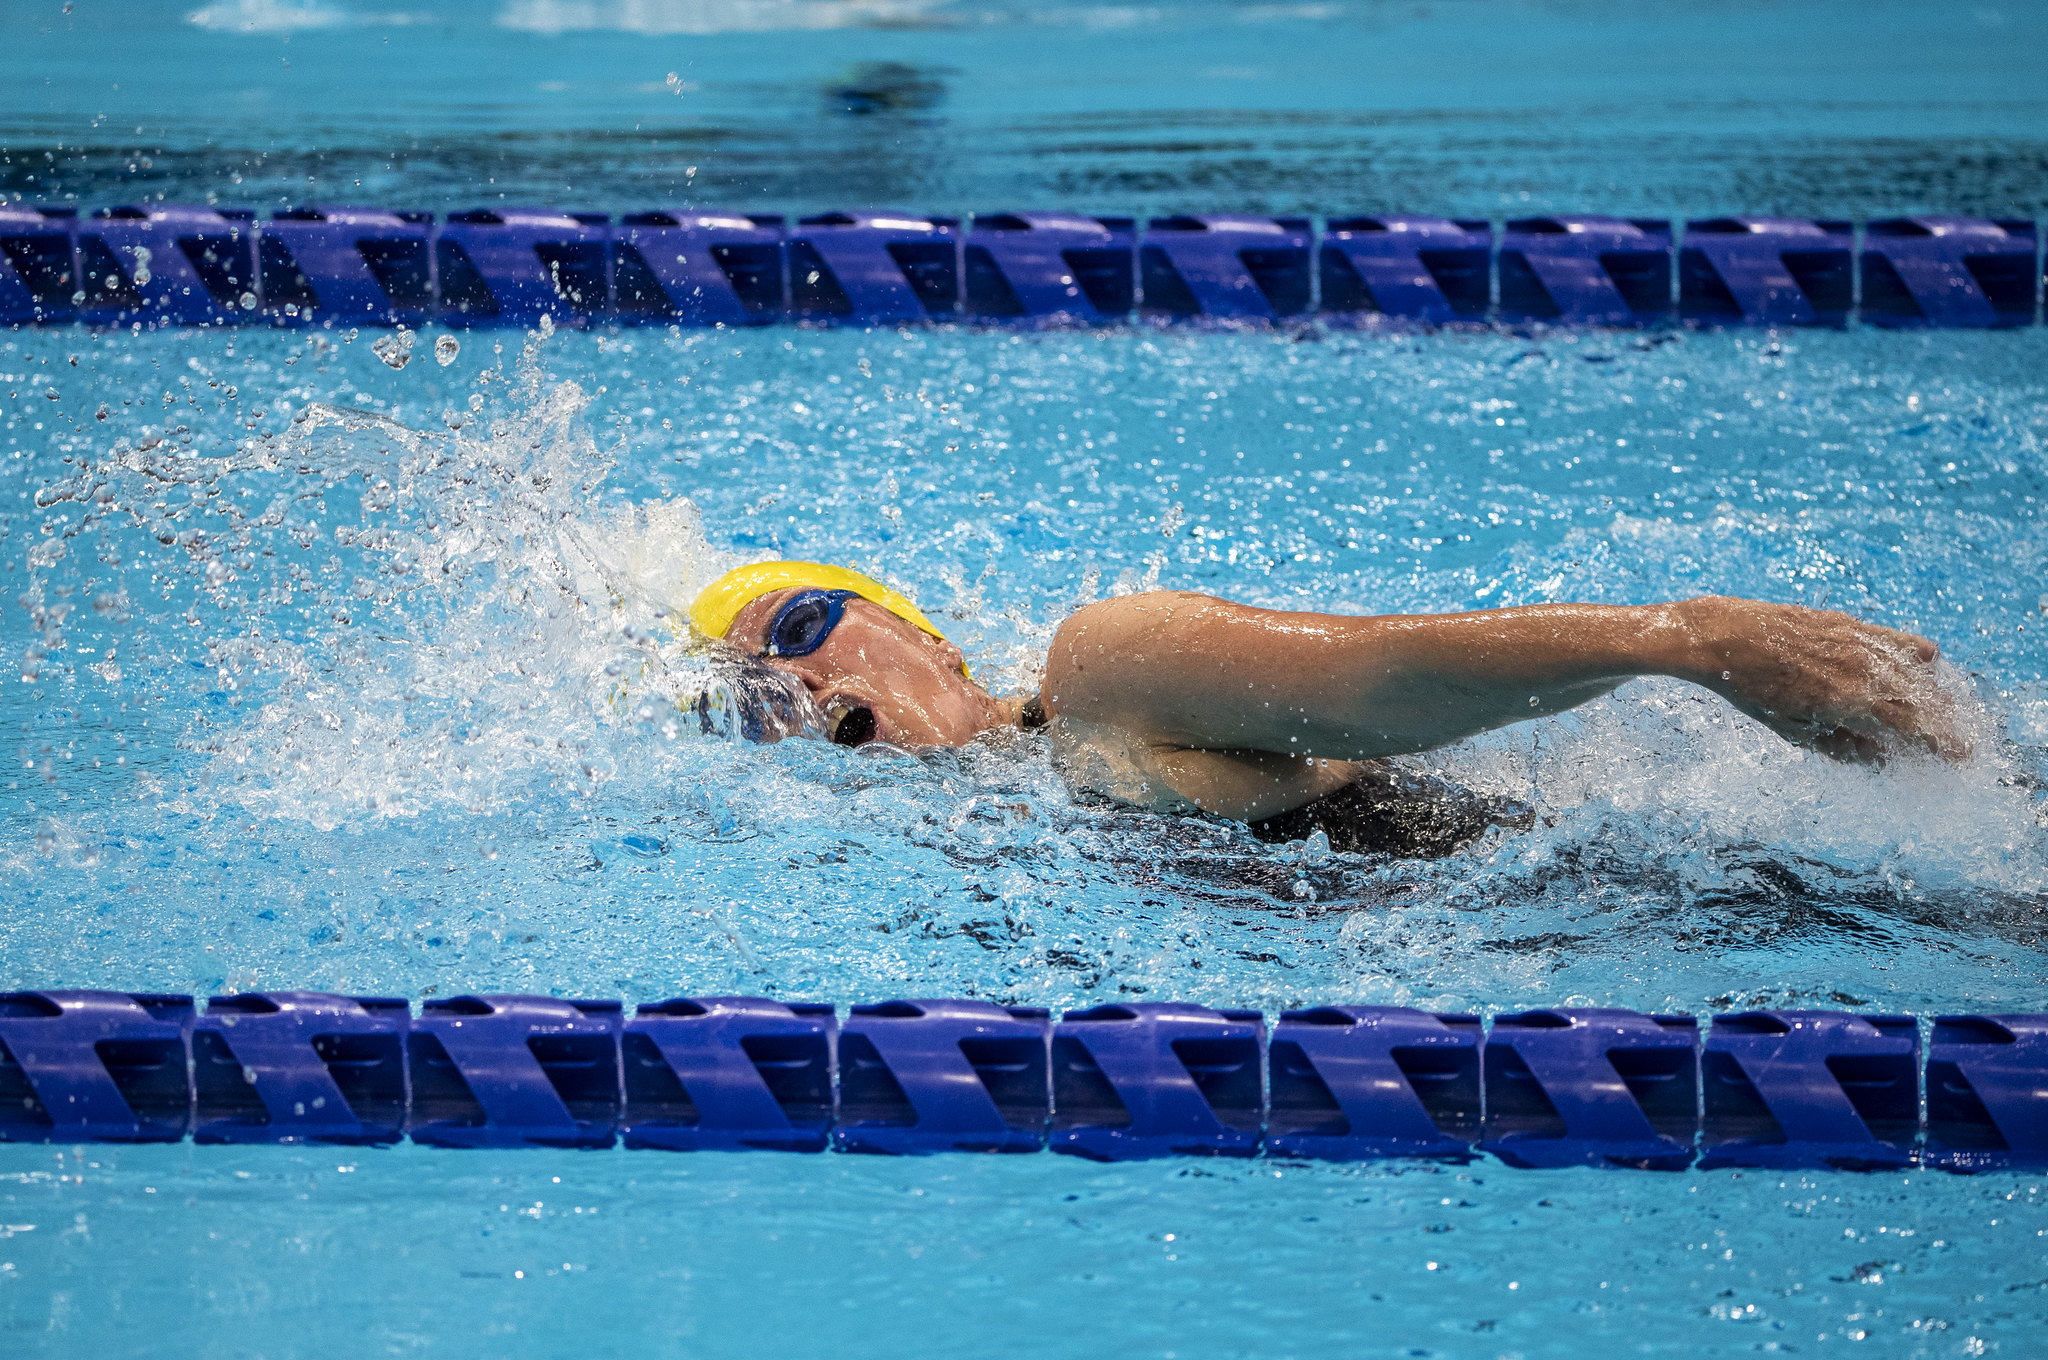 Susana Schnarndorf nada no meio da raia de óculos azul e touca amarela